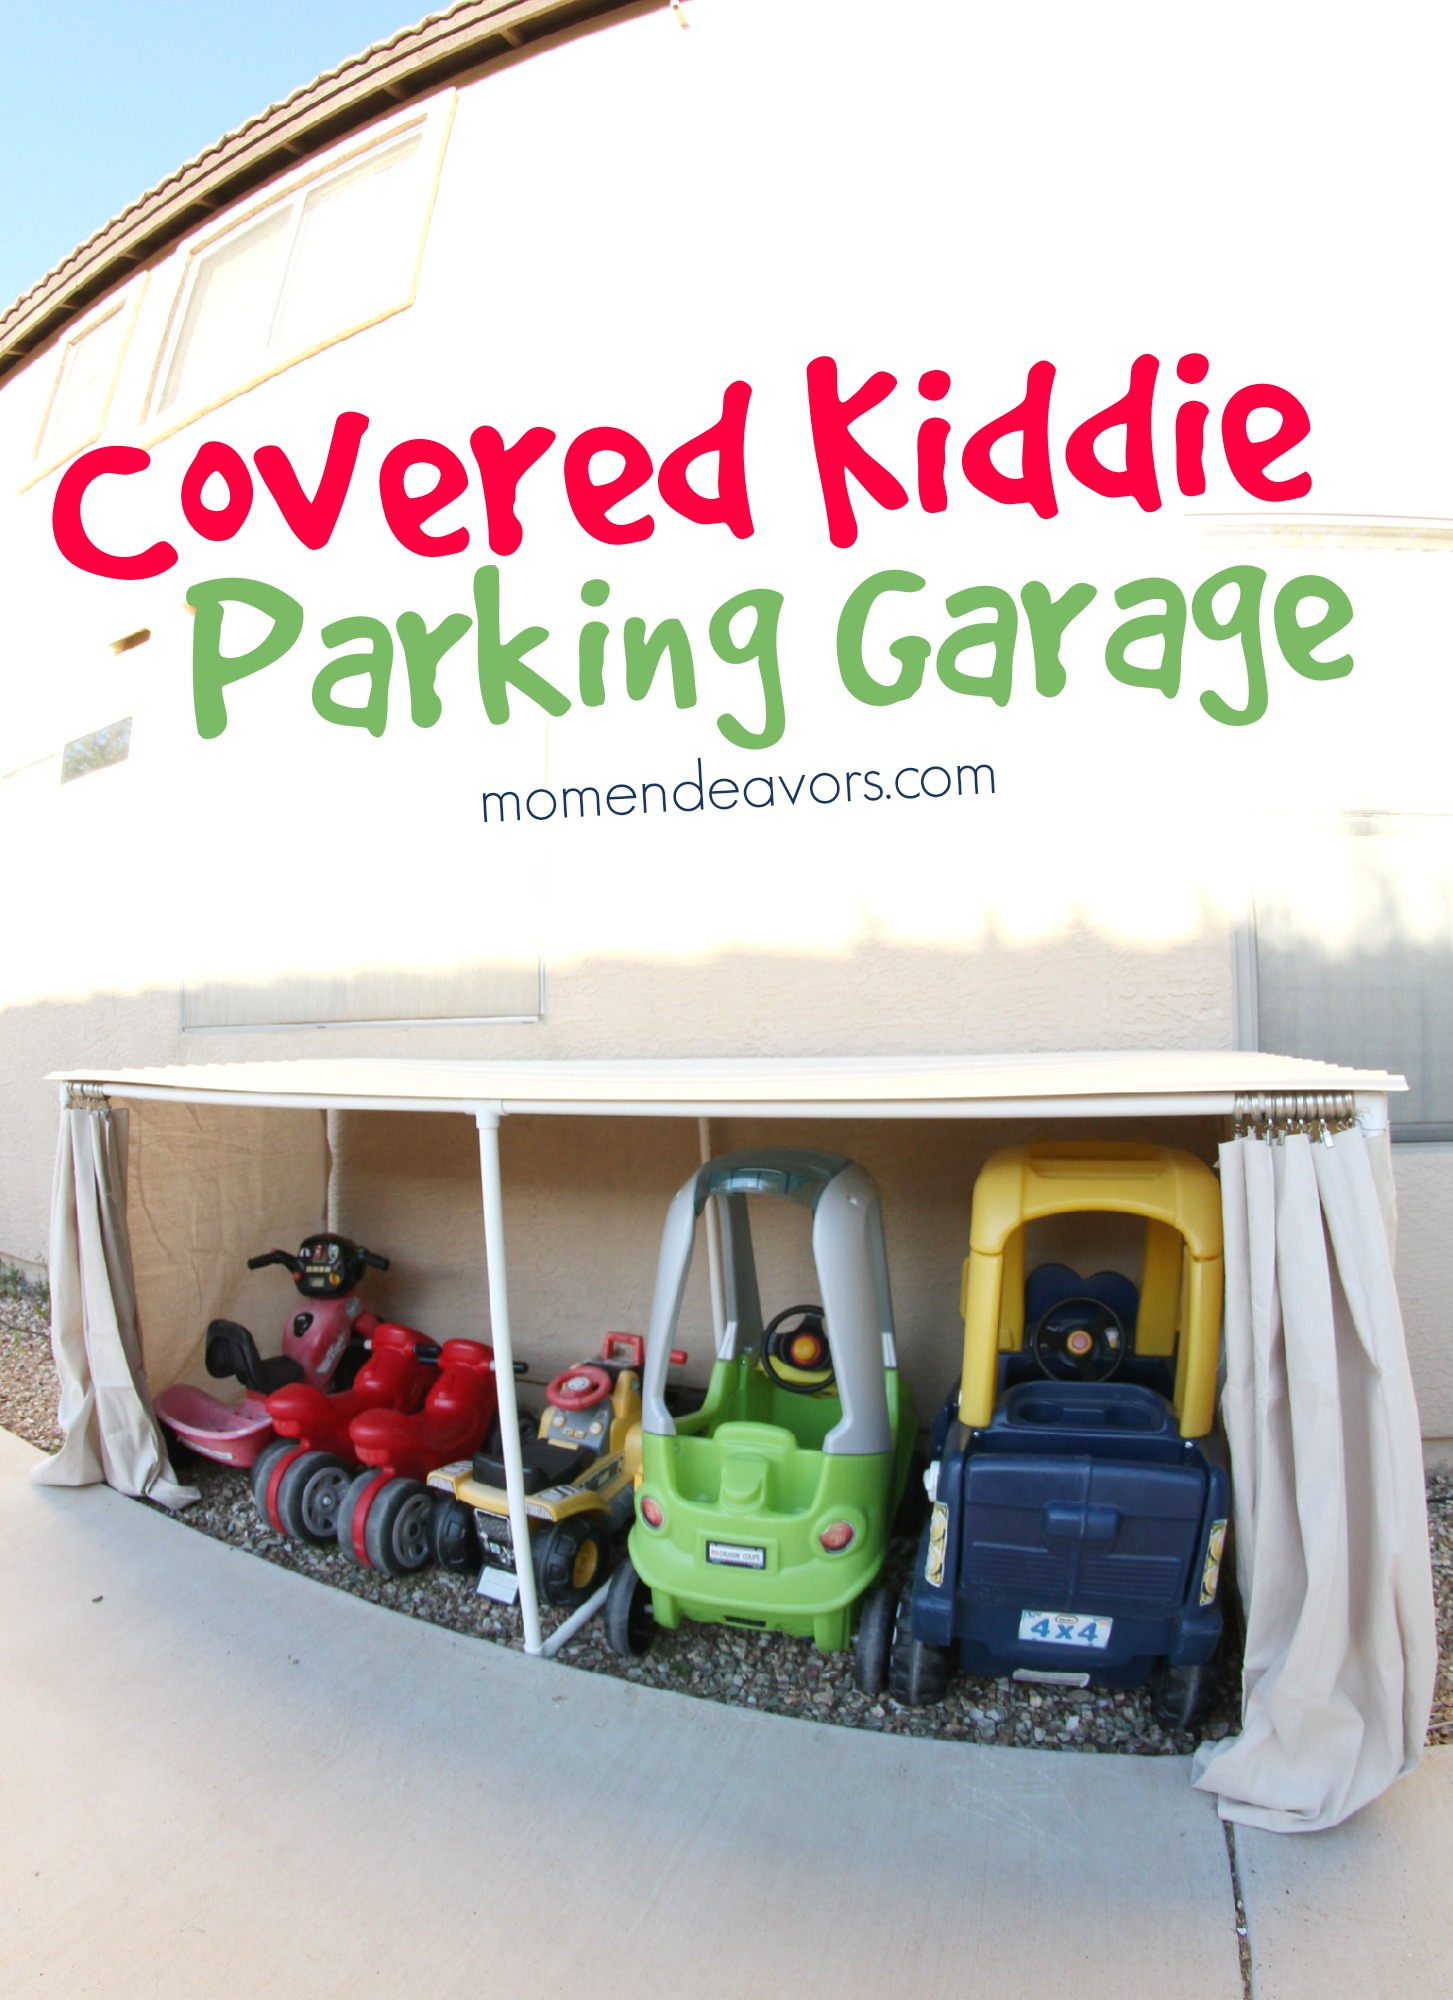 Nicole And Bianca Cutediyprojects Blogger Kid Car Parking Garage Toy Storage Idea